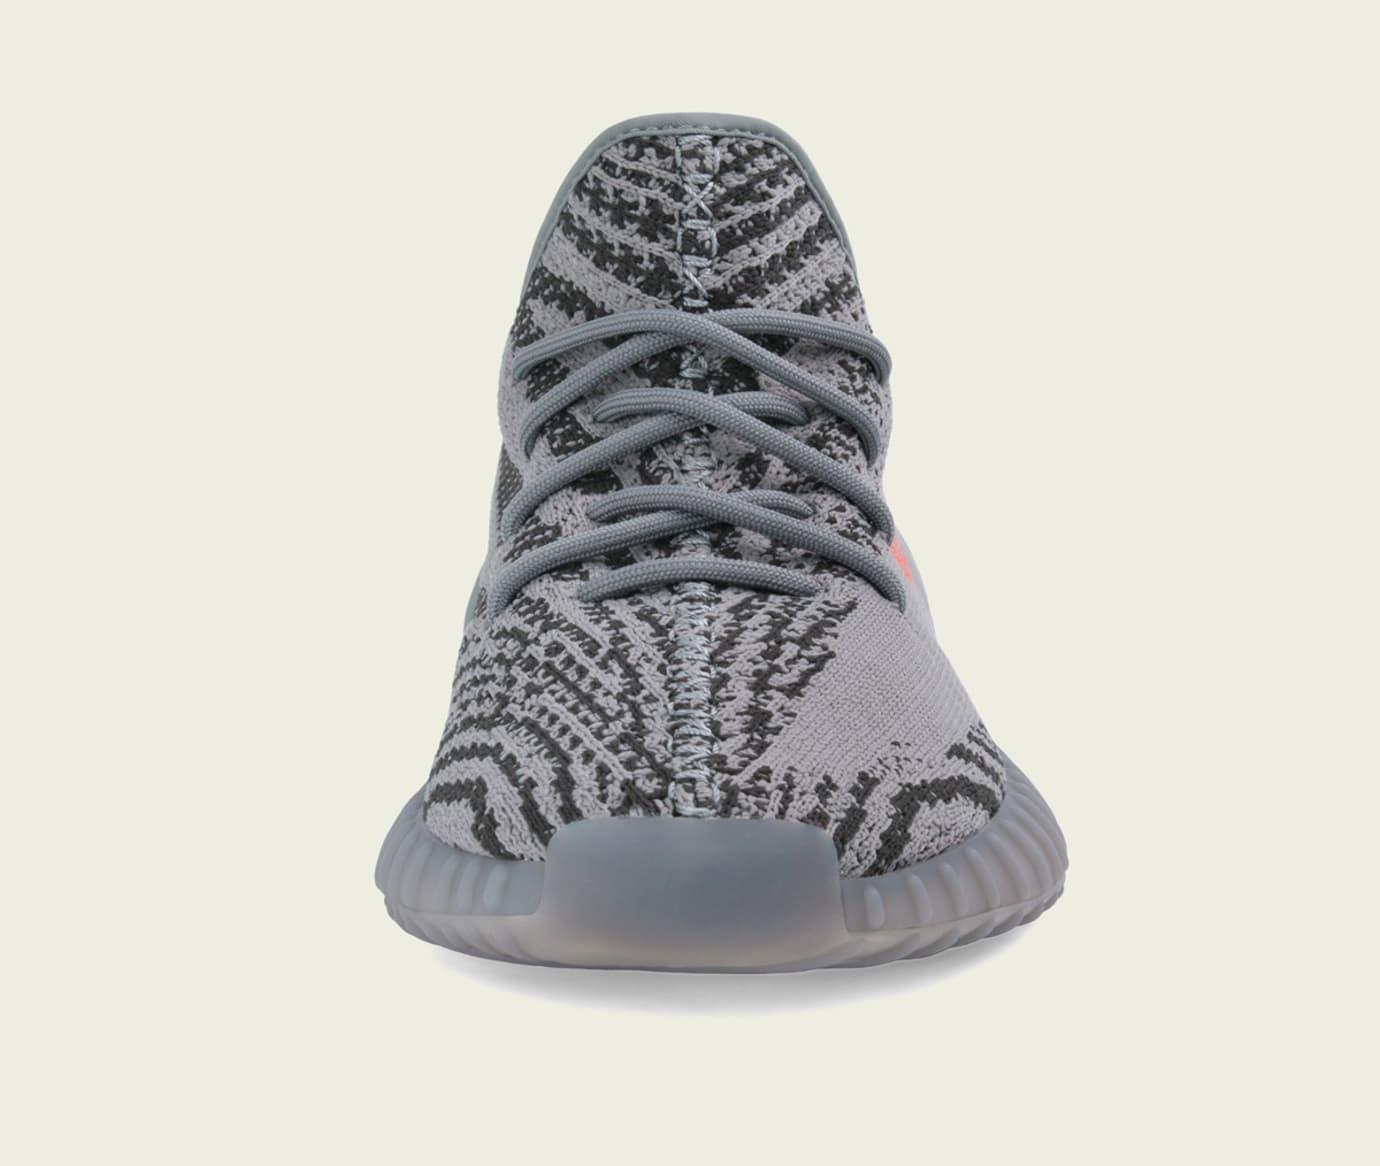 Beluga 2 Adidas Yeezy Boost 350 V2 Toe